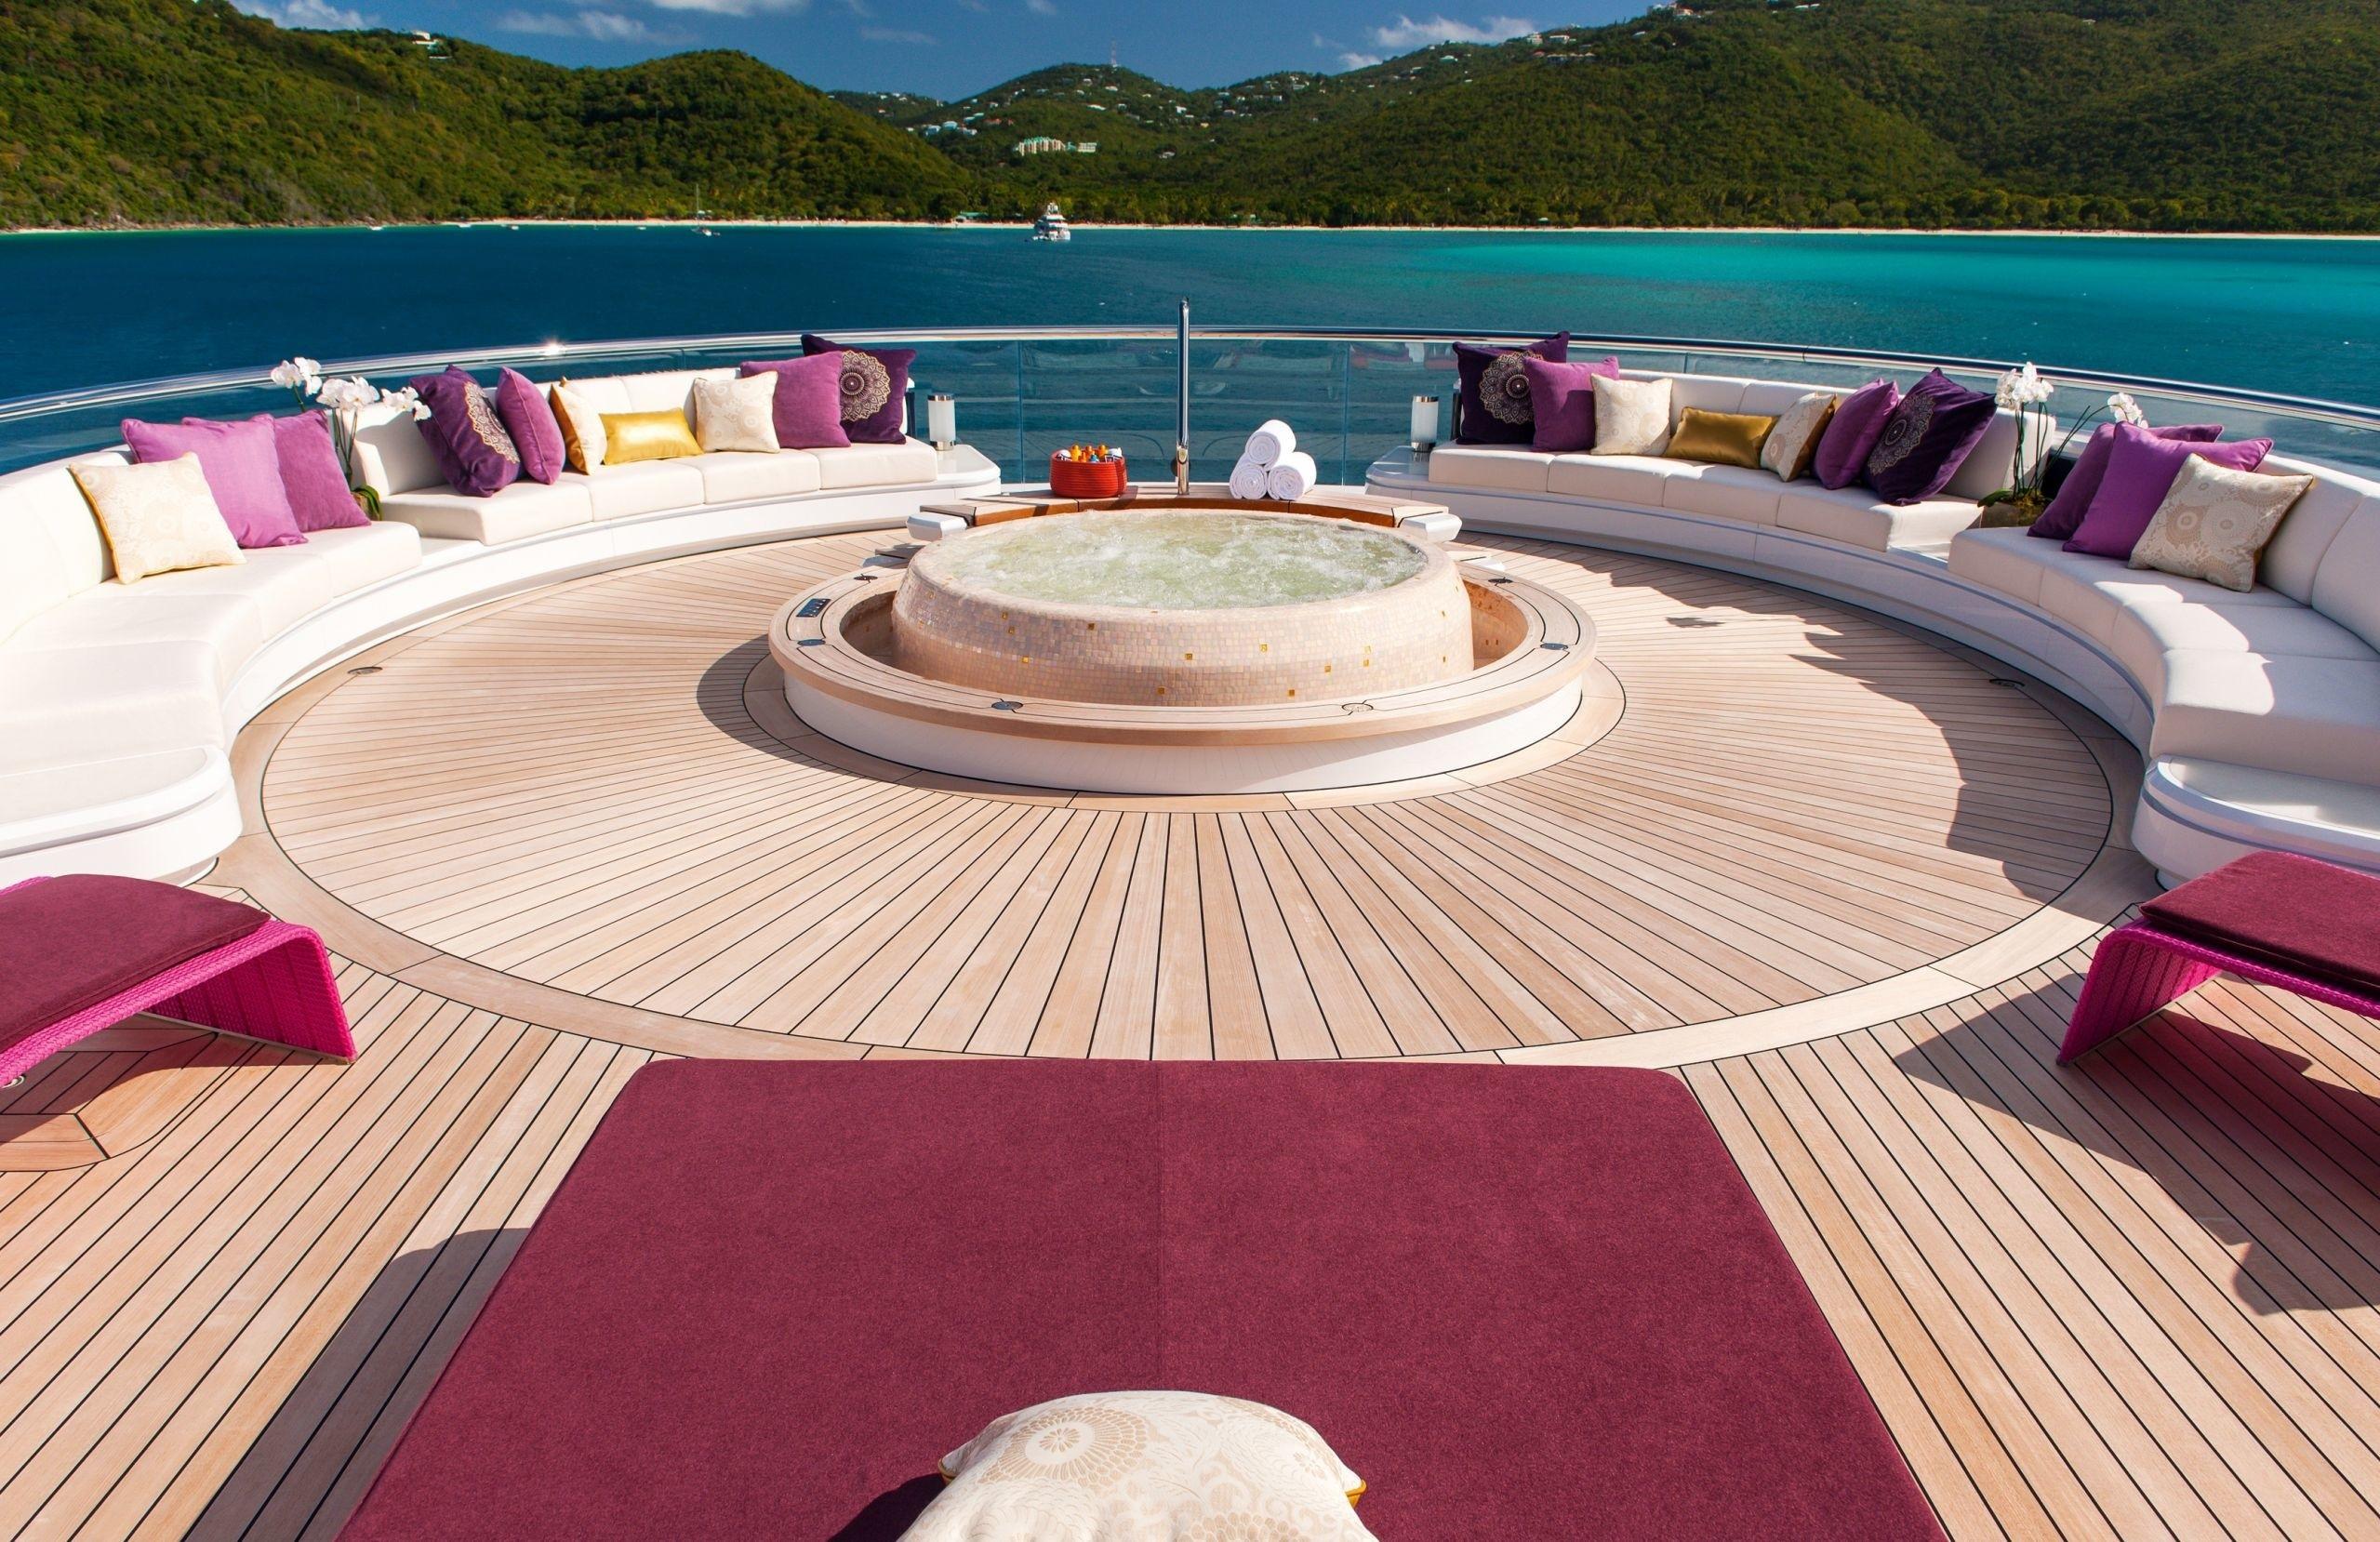 External Sitting With Jacuzzi Pool On Yacht SOLANDGE